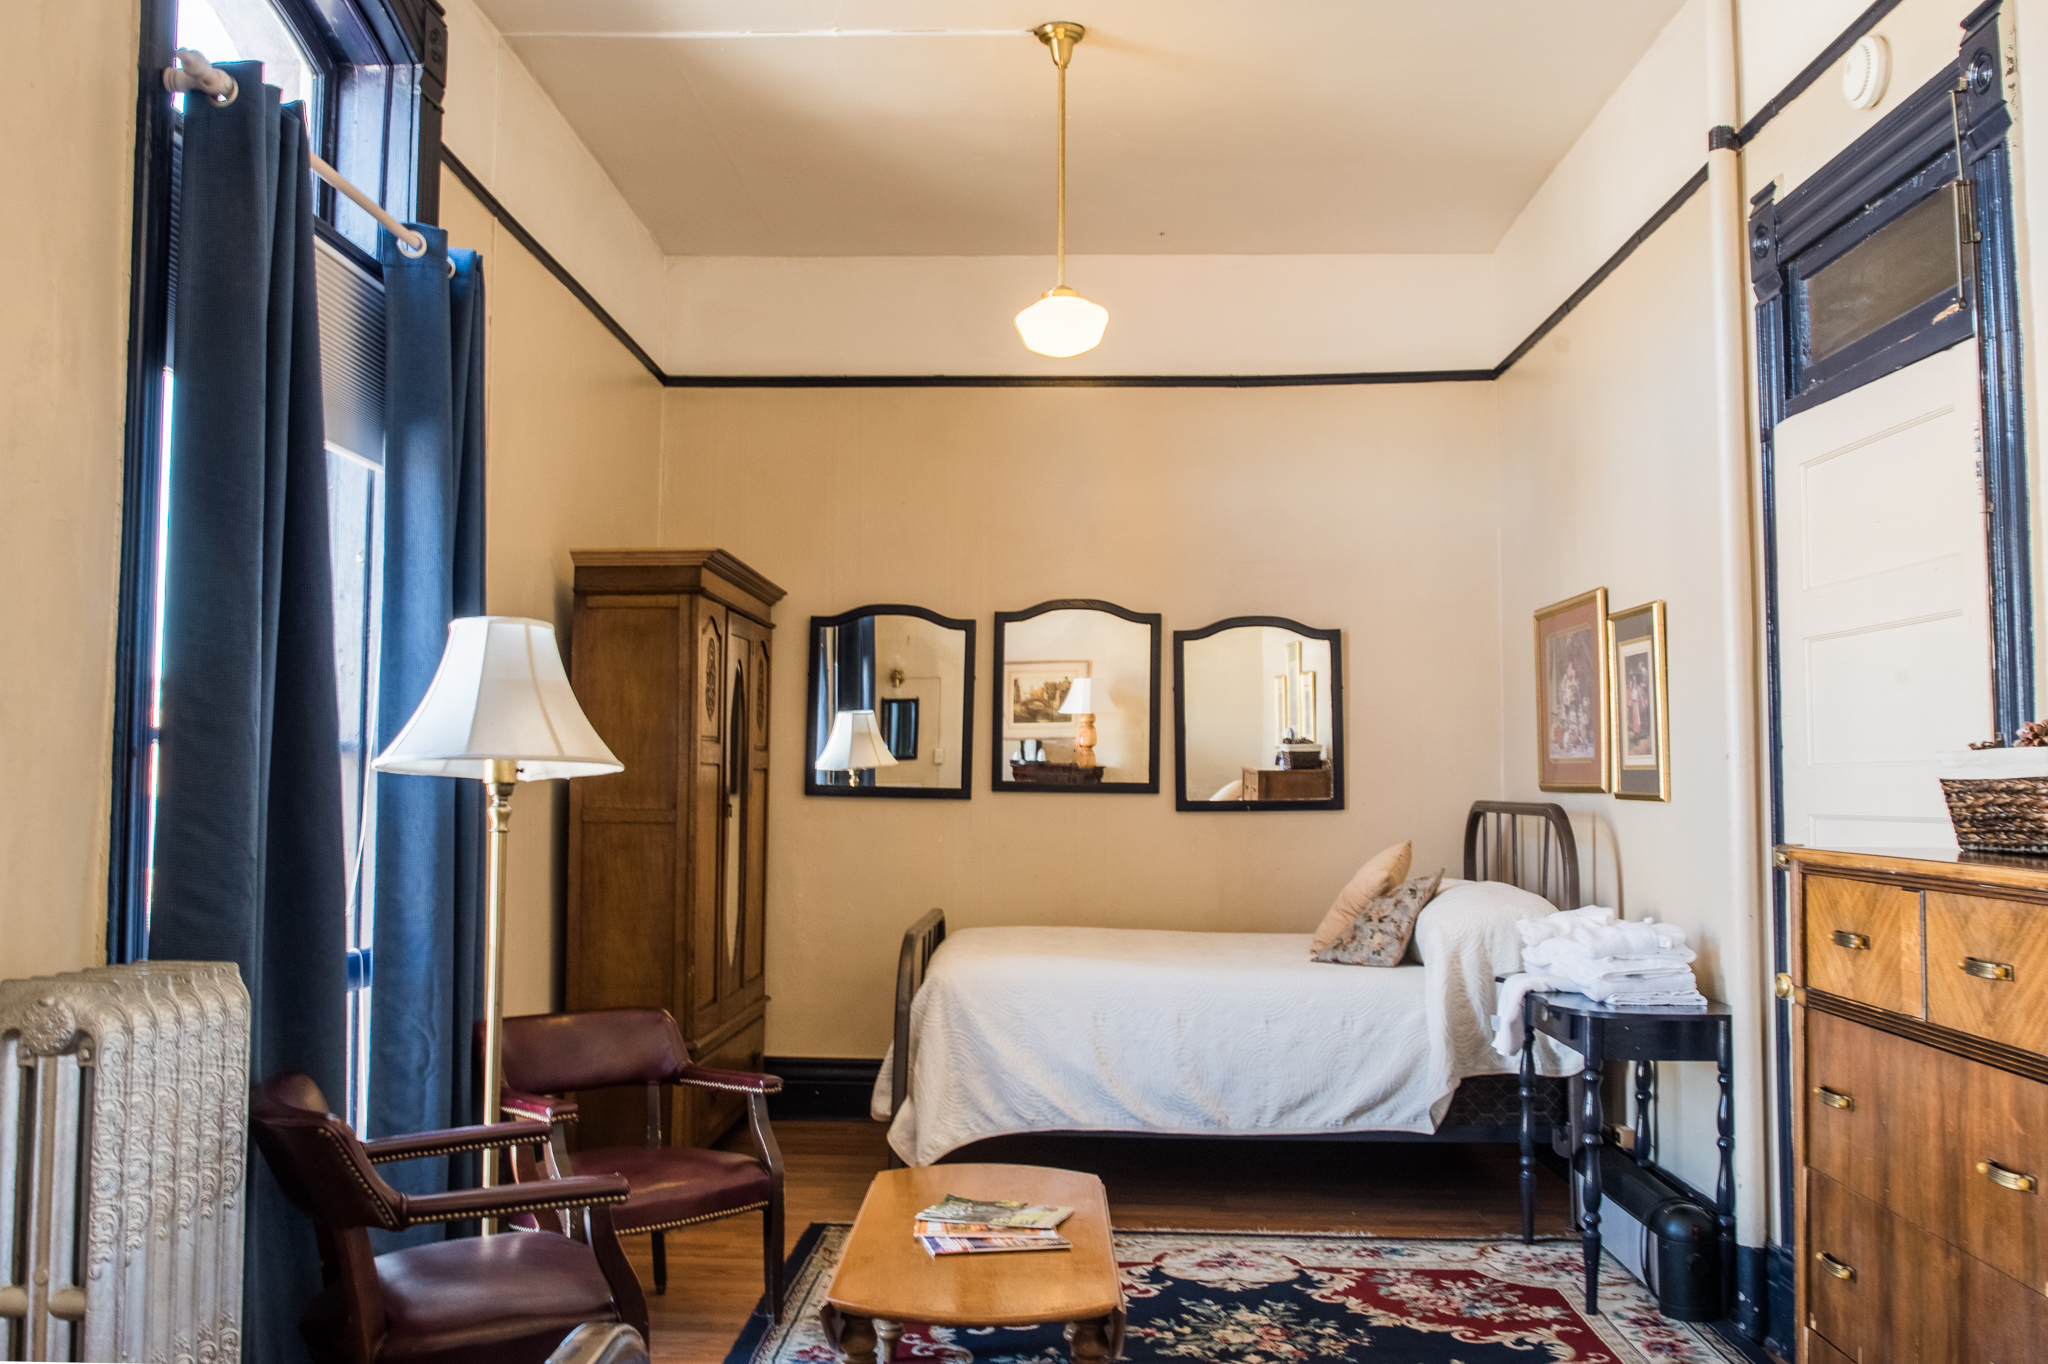 european-style-rooms-hotel-weatherford-flagstaff